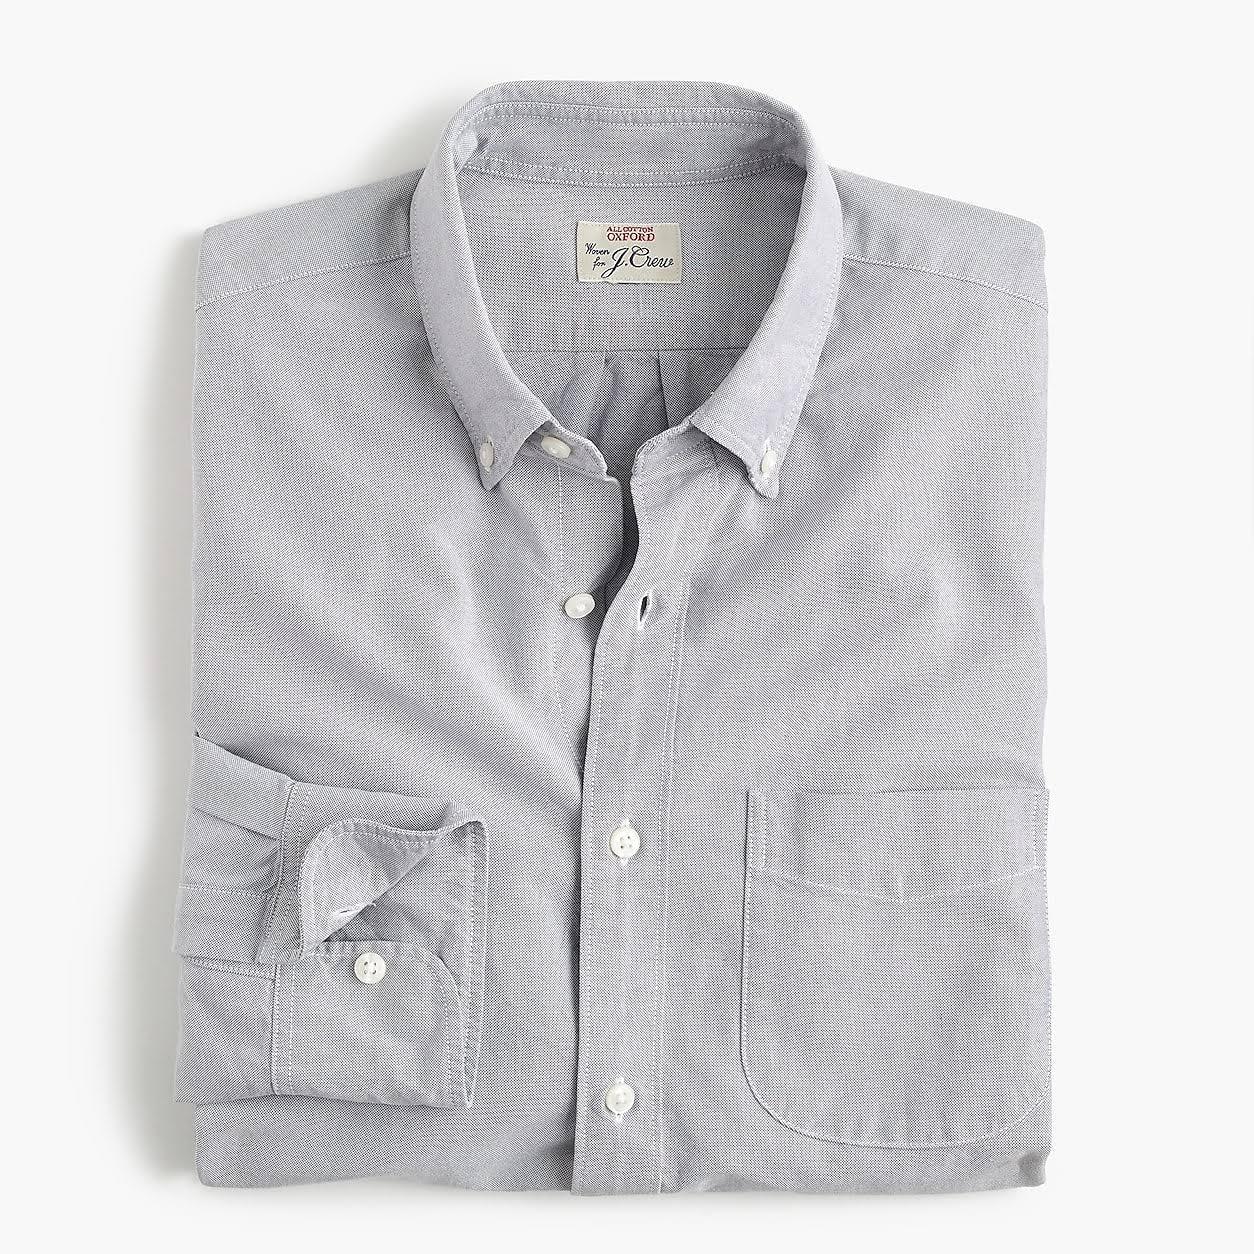 J American Cotton Pima Slim Estiramiento Storm Con tamaño Shirt crew Pequeño Mecánico Mens Oxford Cloud XqRtfXr